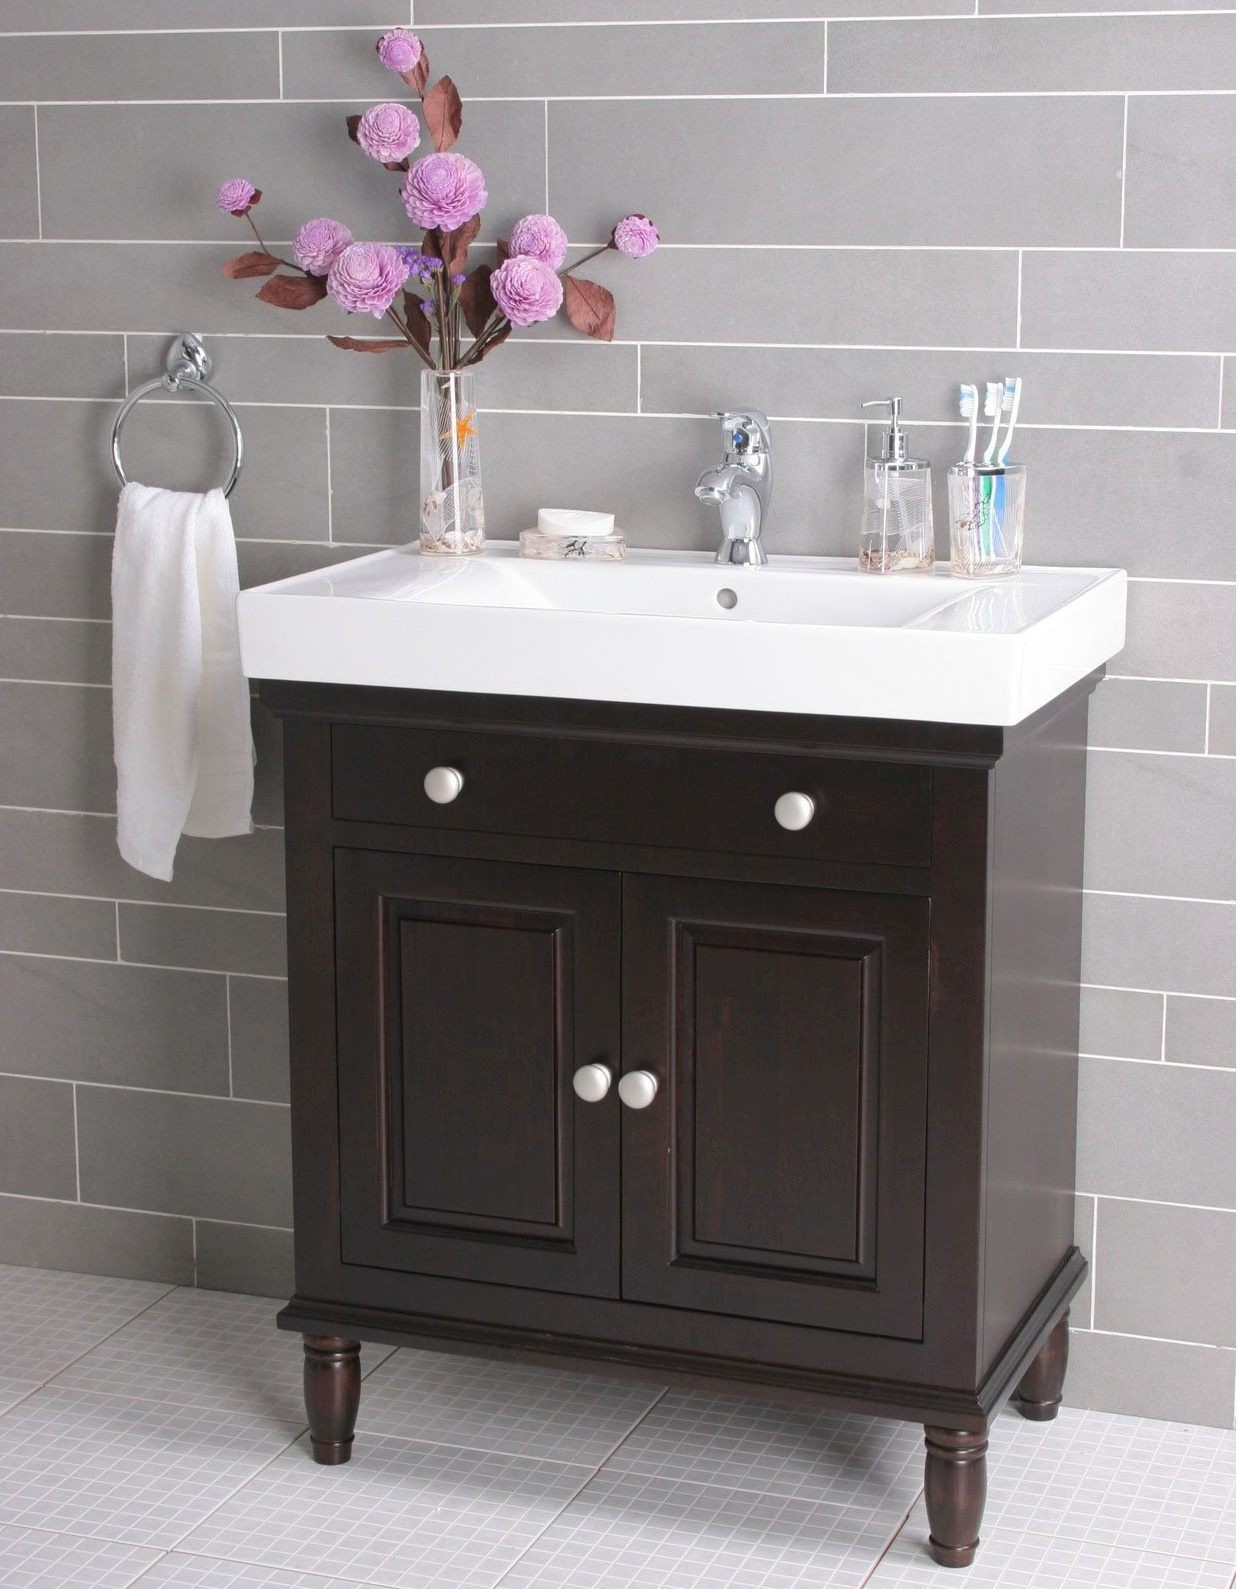 Stylish Menards Bathroom Vanity Photograph